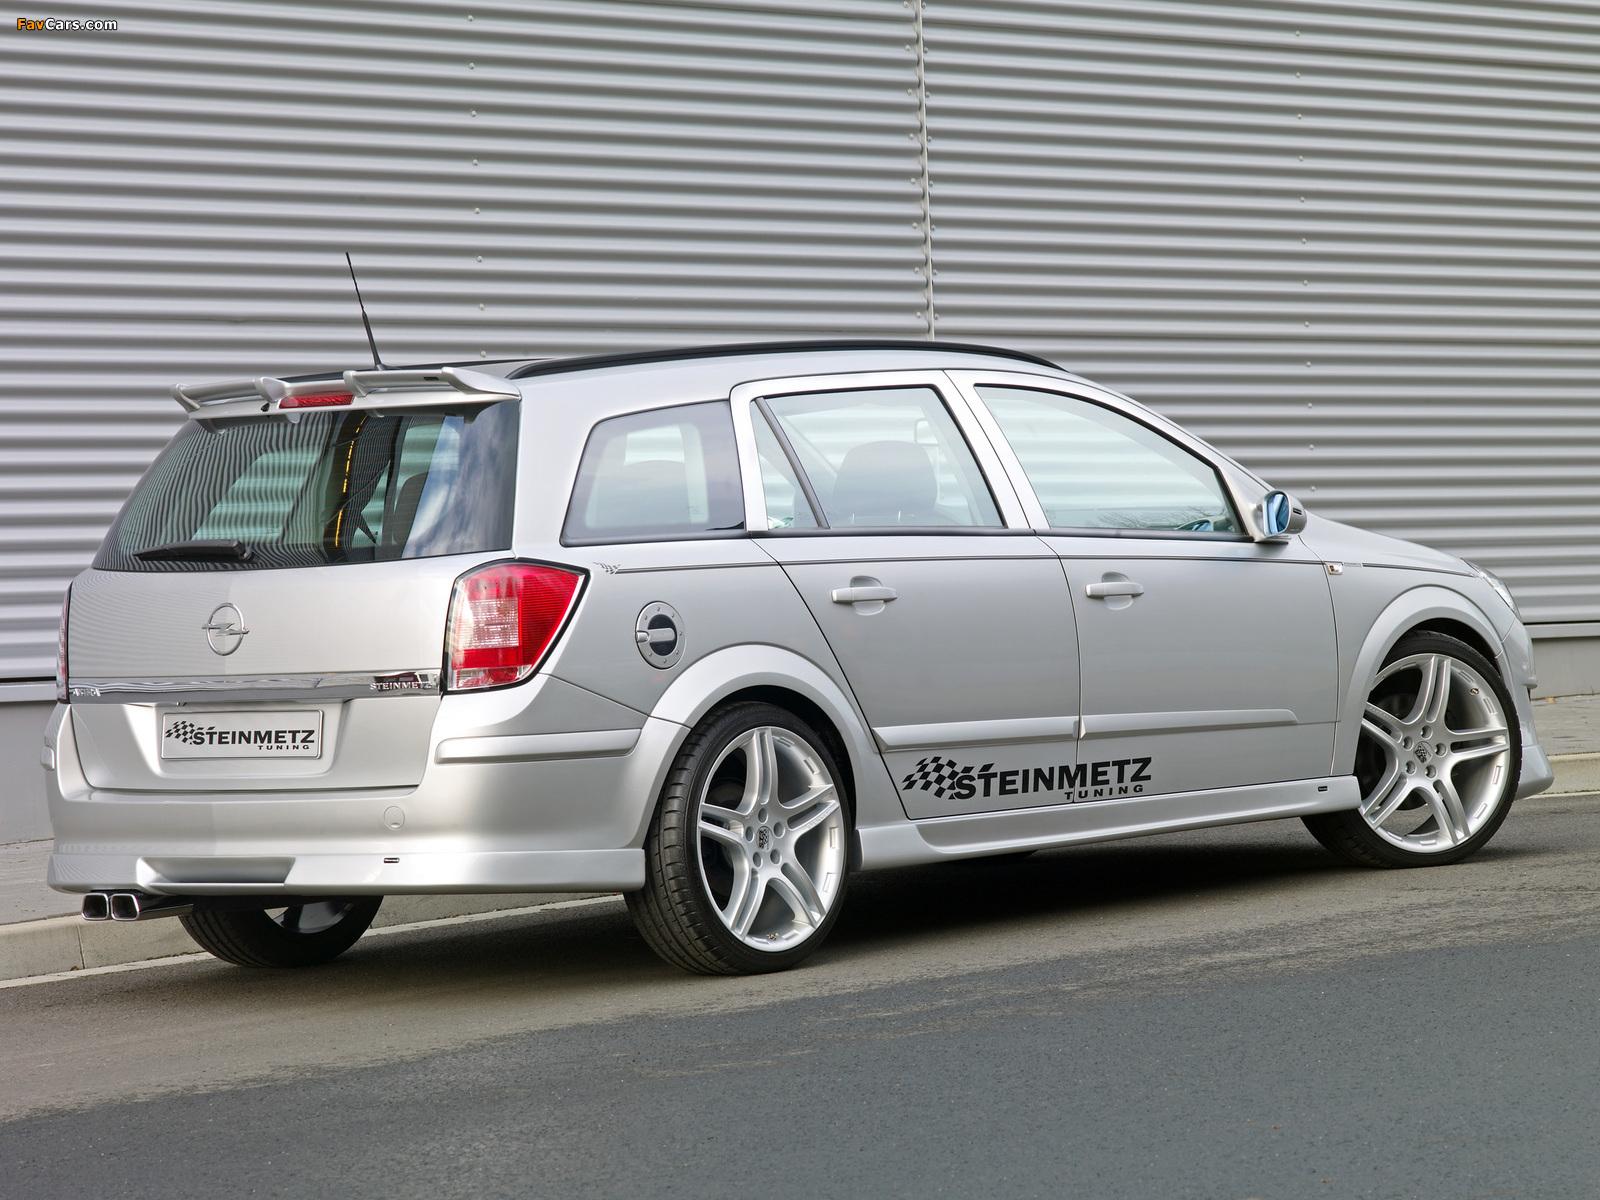 Steinmetz Opel Astra Caravan (H) 2007 photos (1600 x 1200)